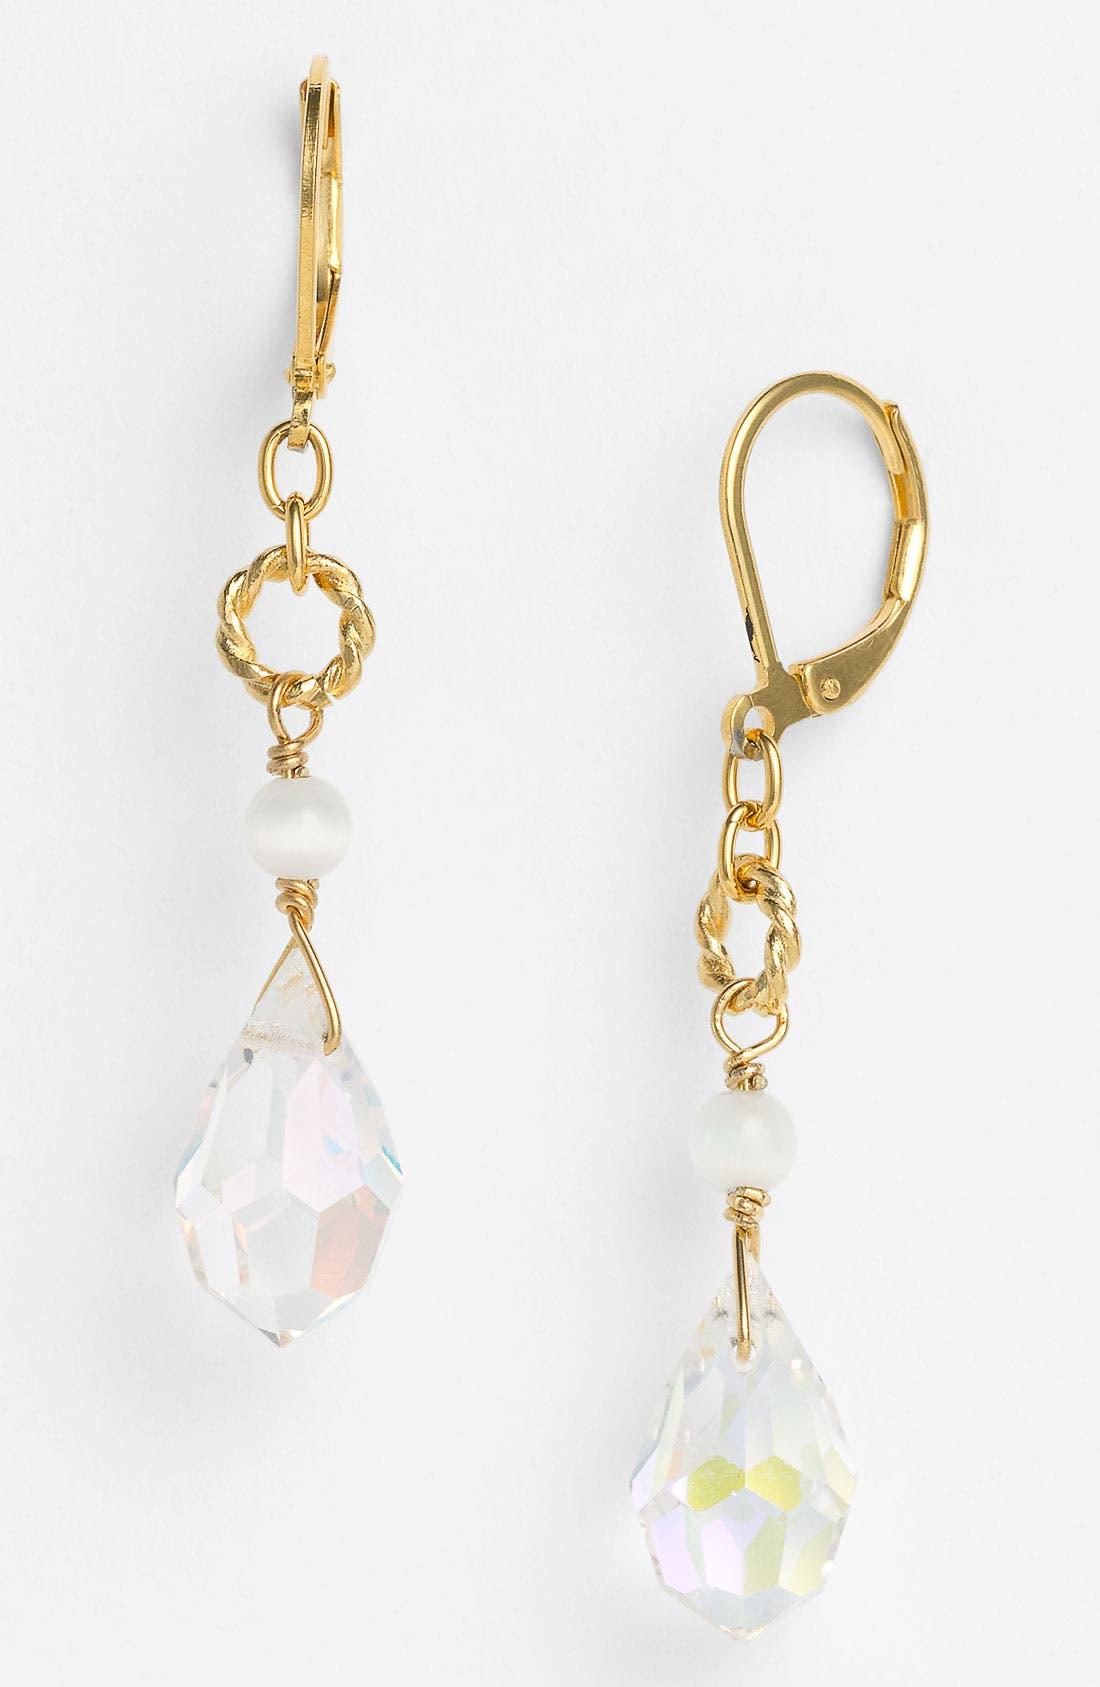 Main Image - Dabby Reid 'Zoe' Crystal Earrings